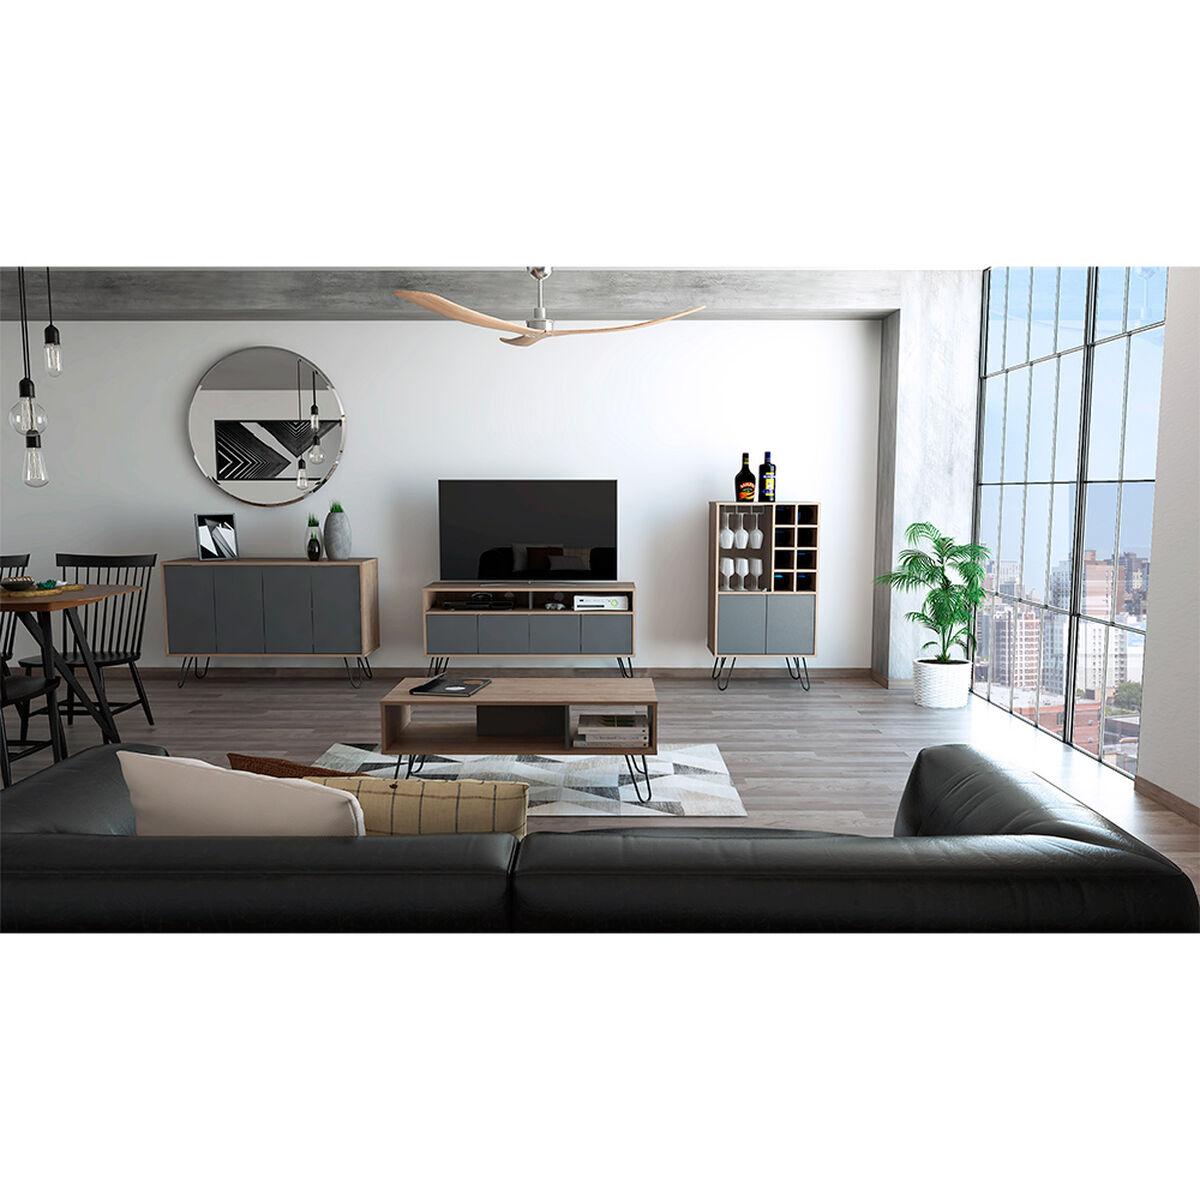 "Rack Tv 55"" + Bar + Bife + Mesa Centro Vassel"